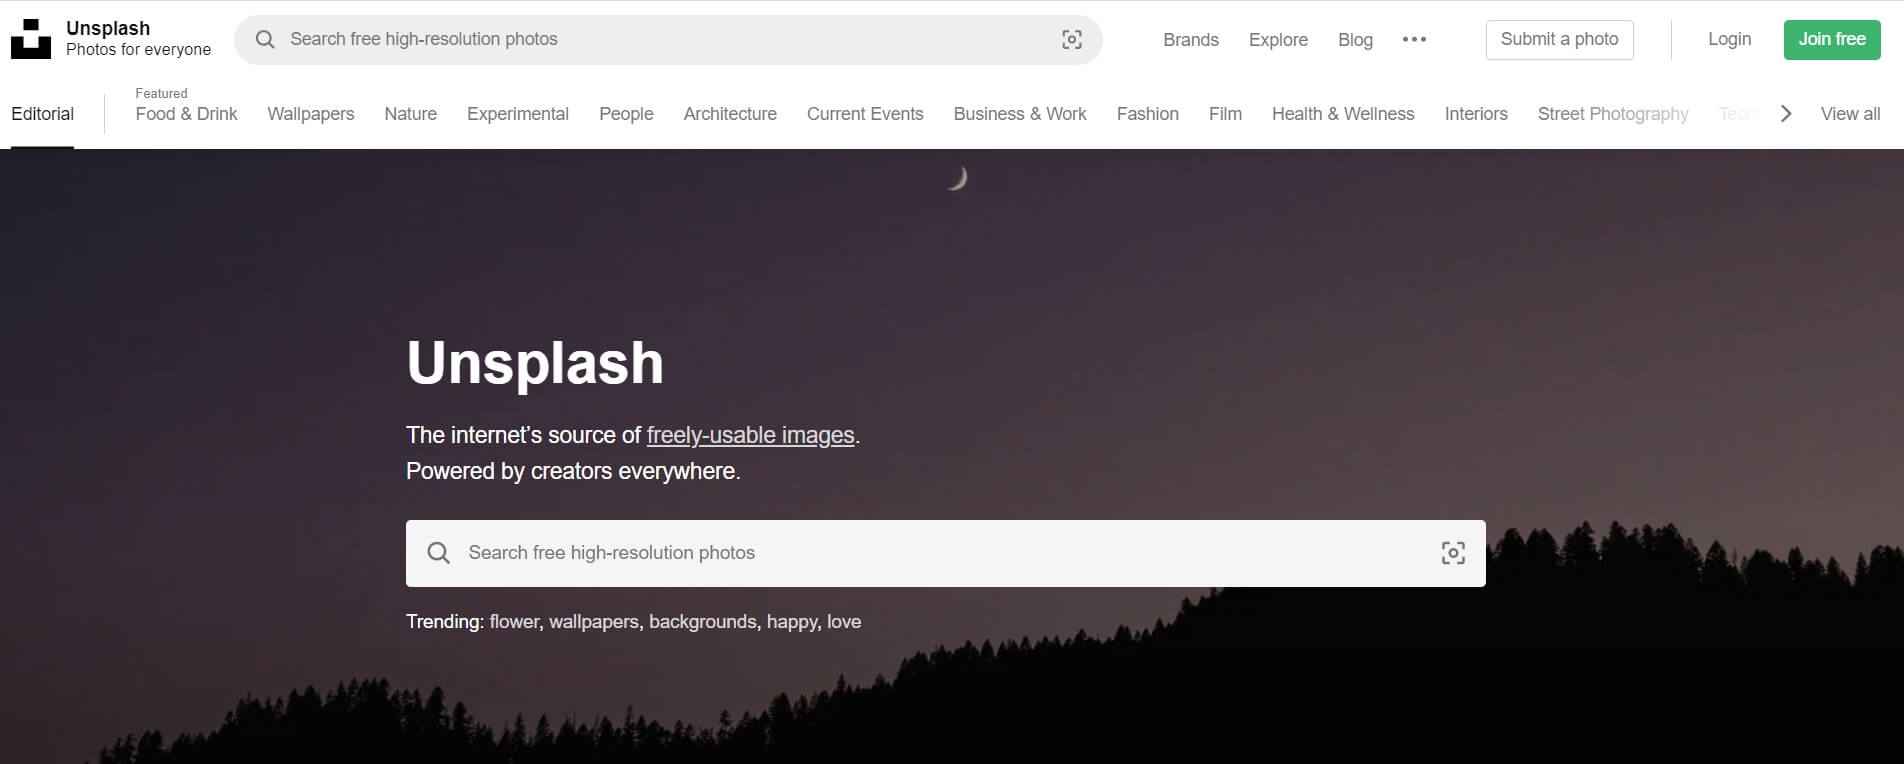 A screenshot of the Unsplash homepage.